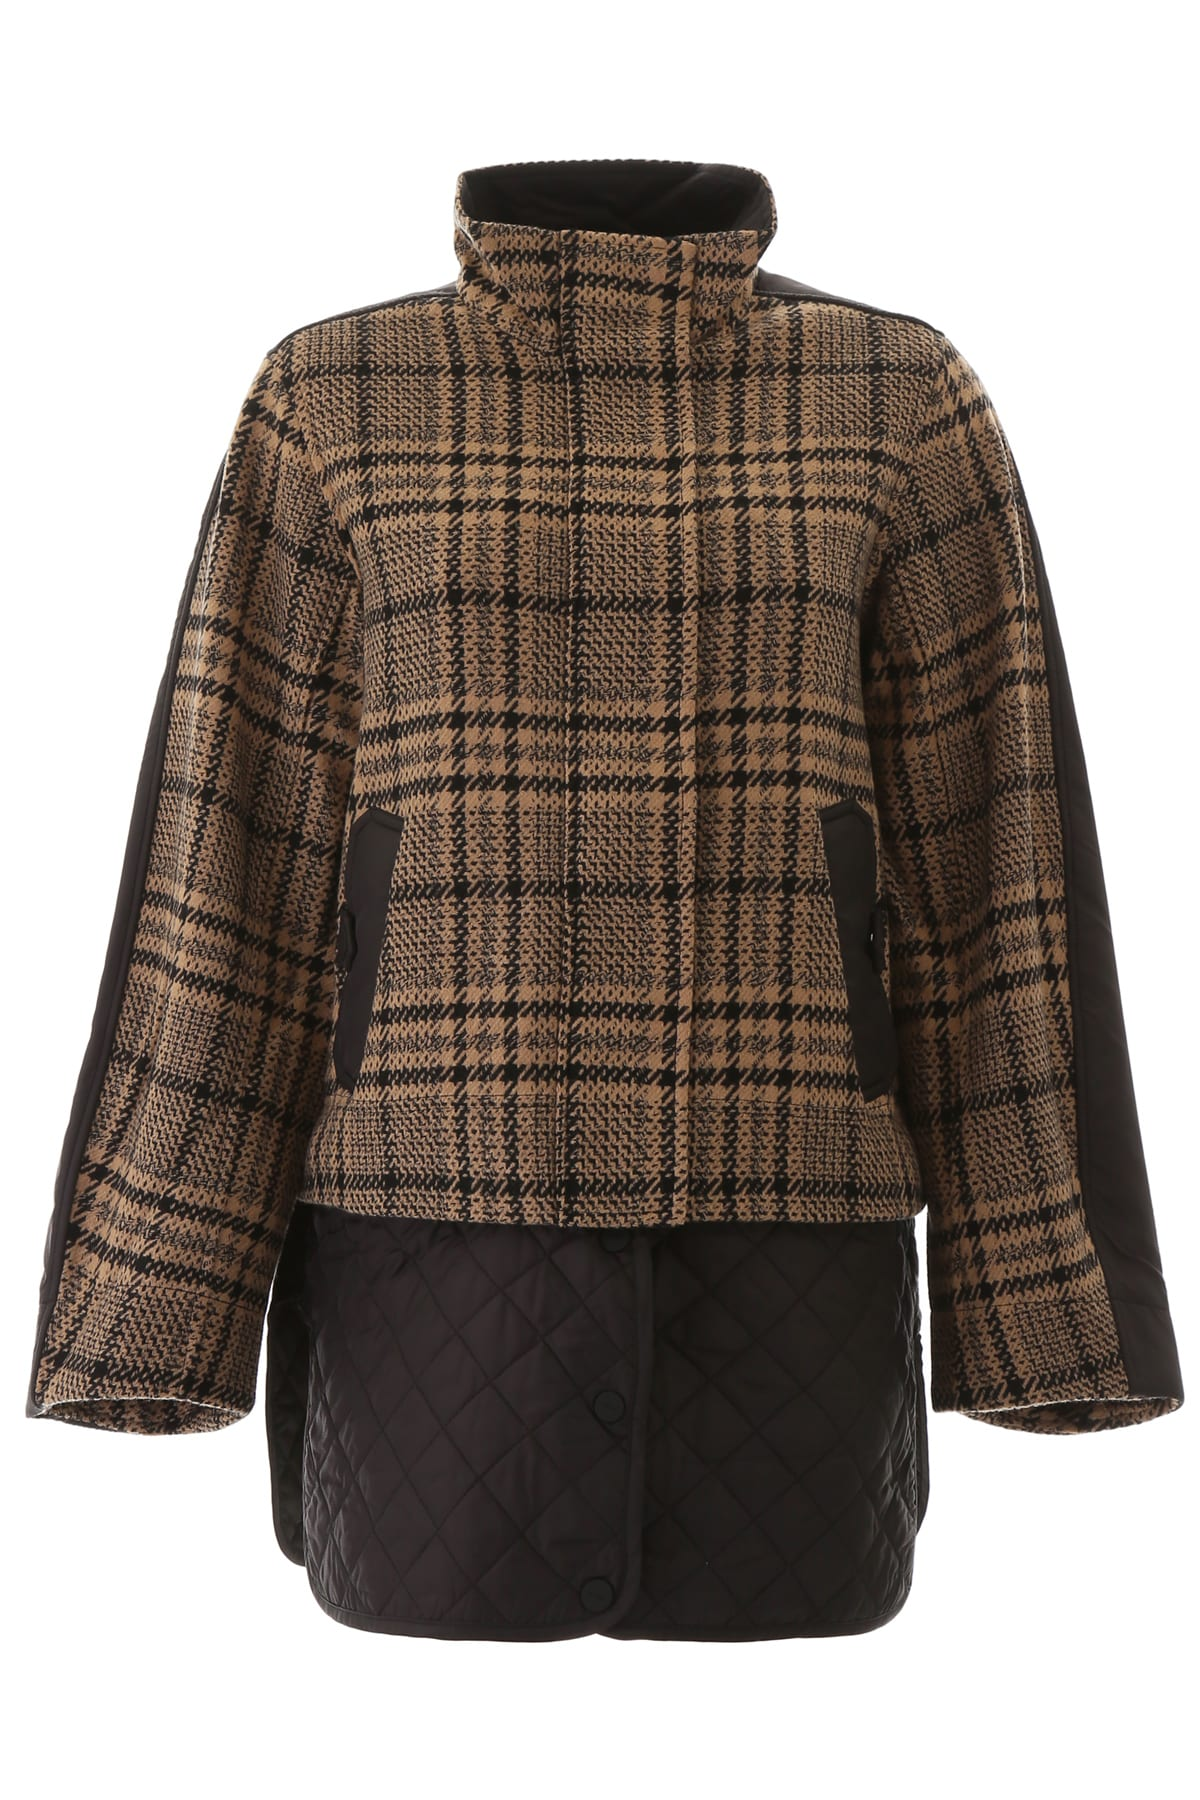 Ganni Tartan Wool Jacket